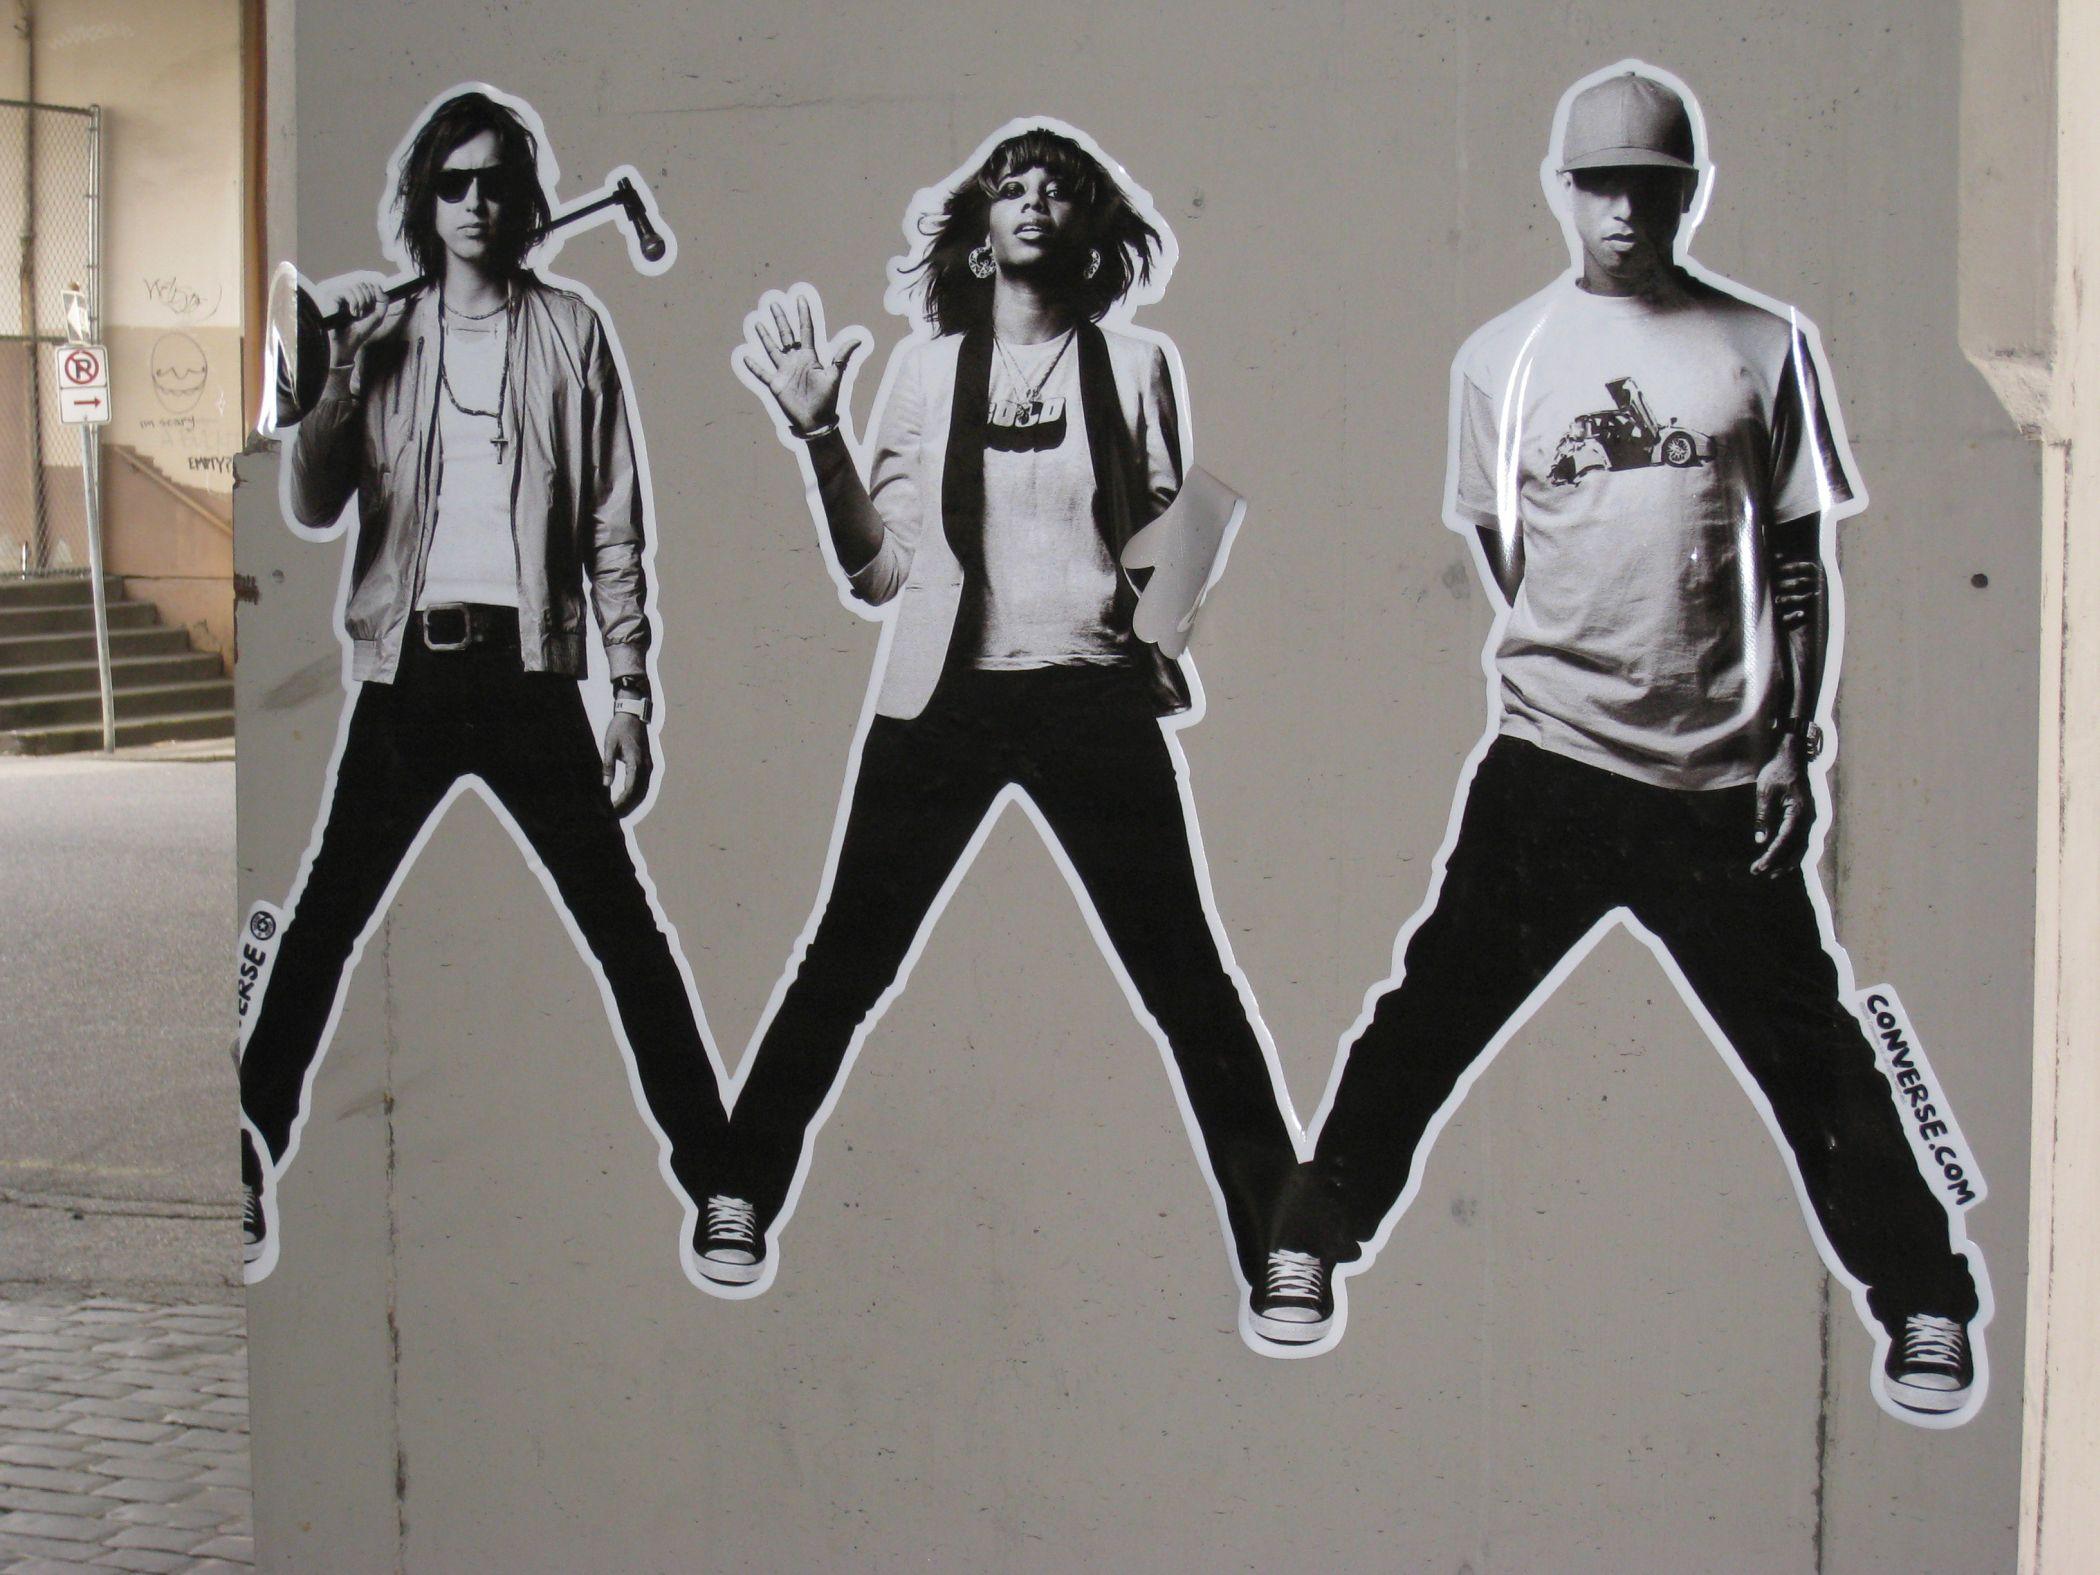 e1e584abae990 The Strokes, Santogold i Pharrel Williams w kampanii Converse (fot. Michael  Pittman /